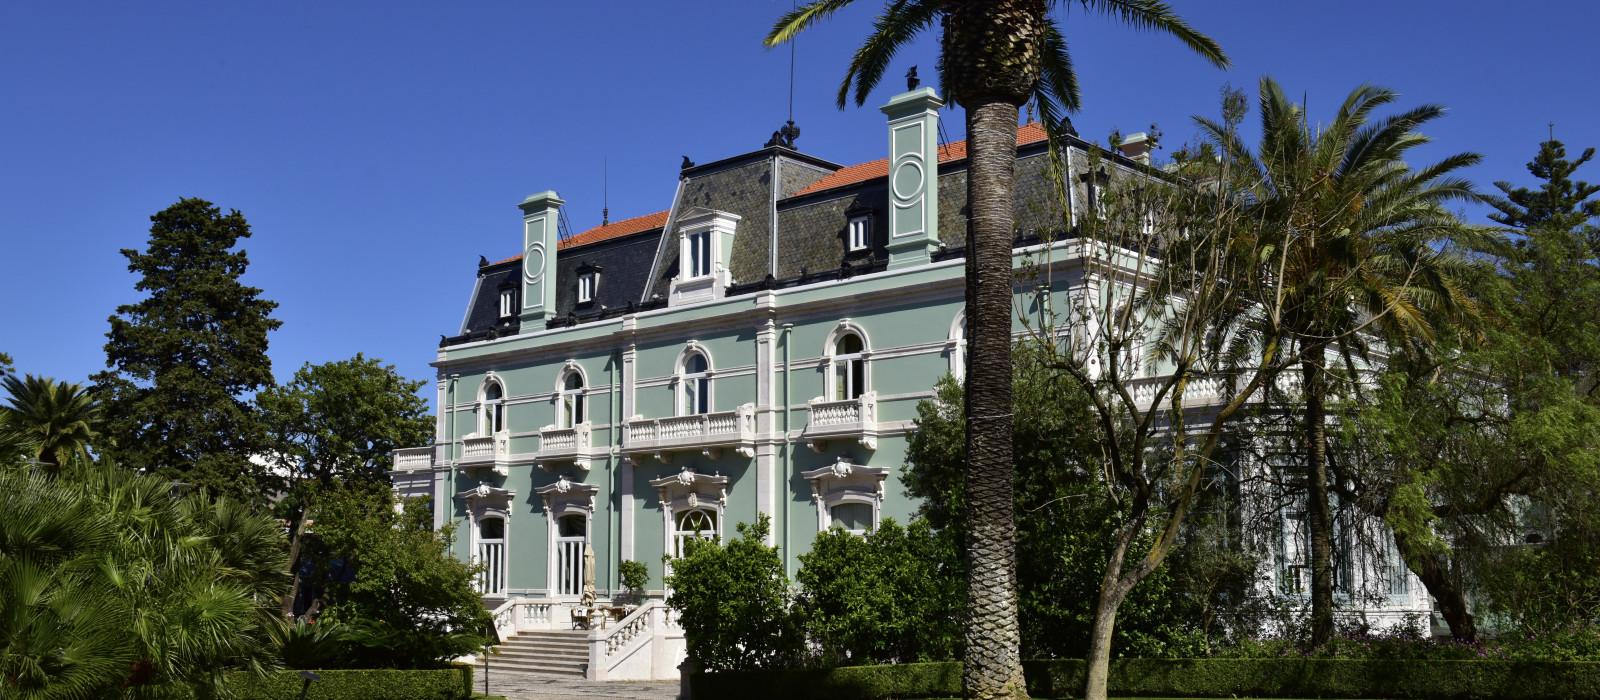 Hotel Pestana Palace Lisboa Portugal